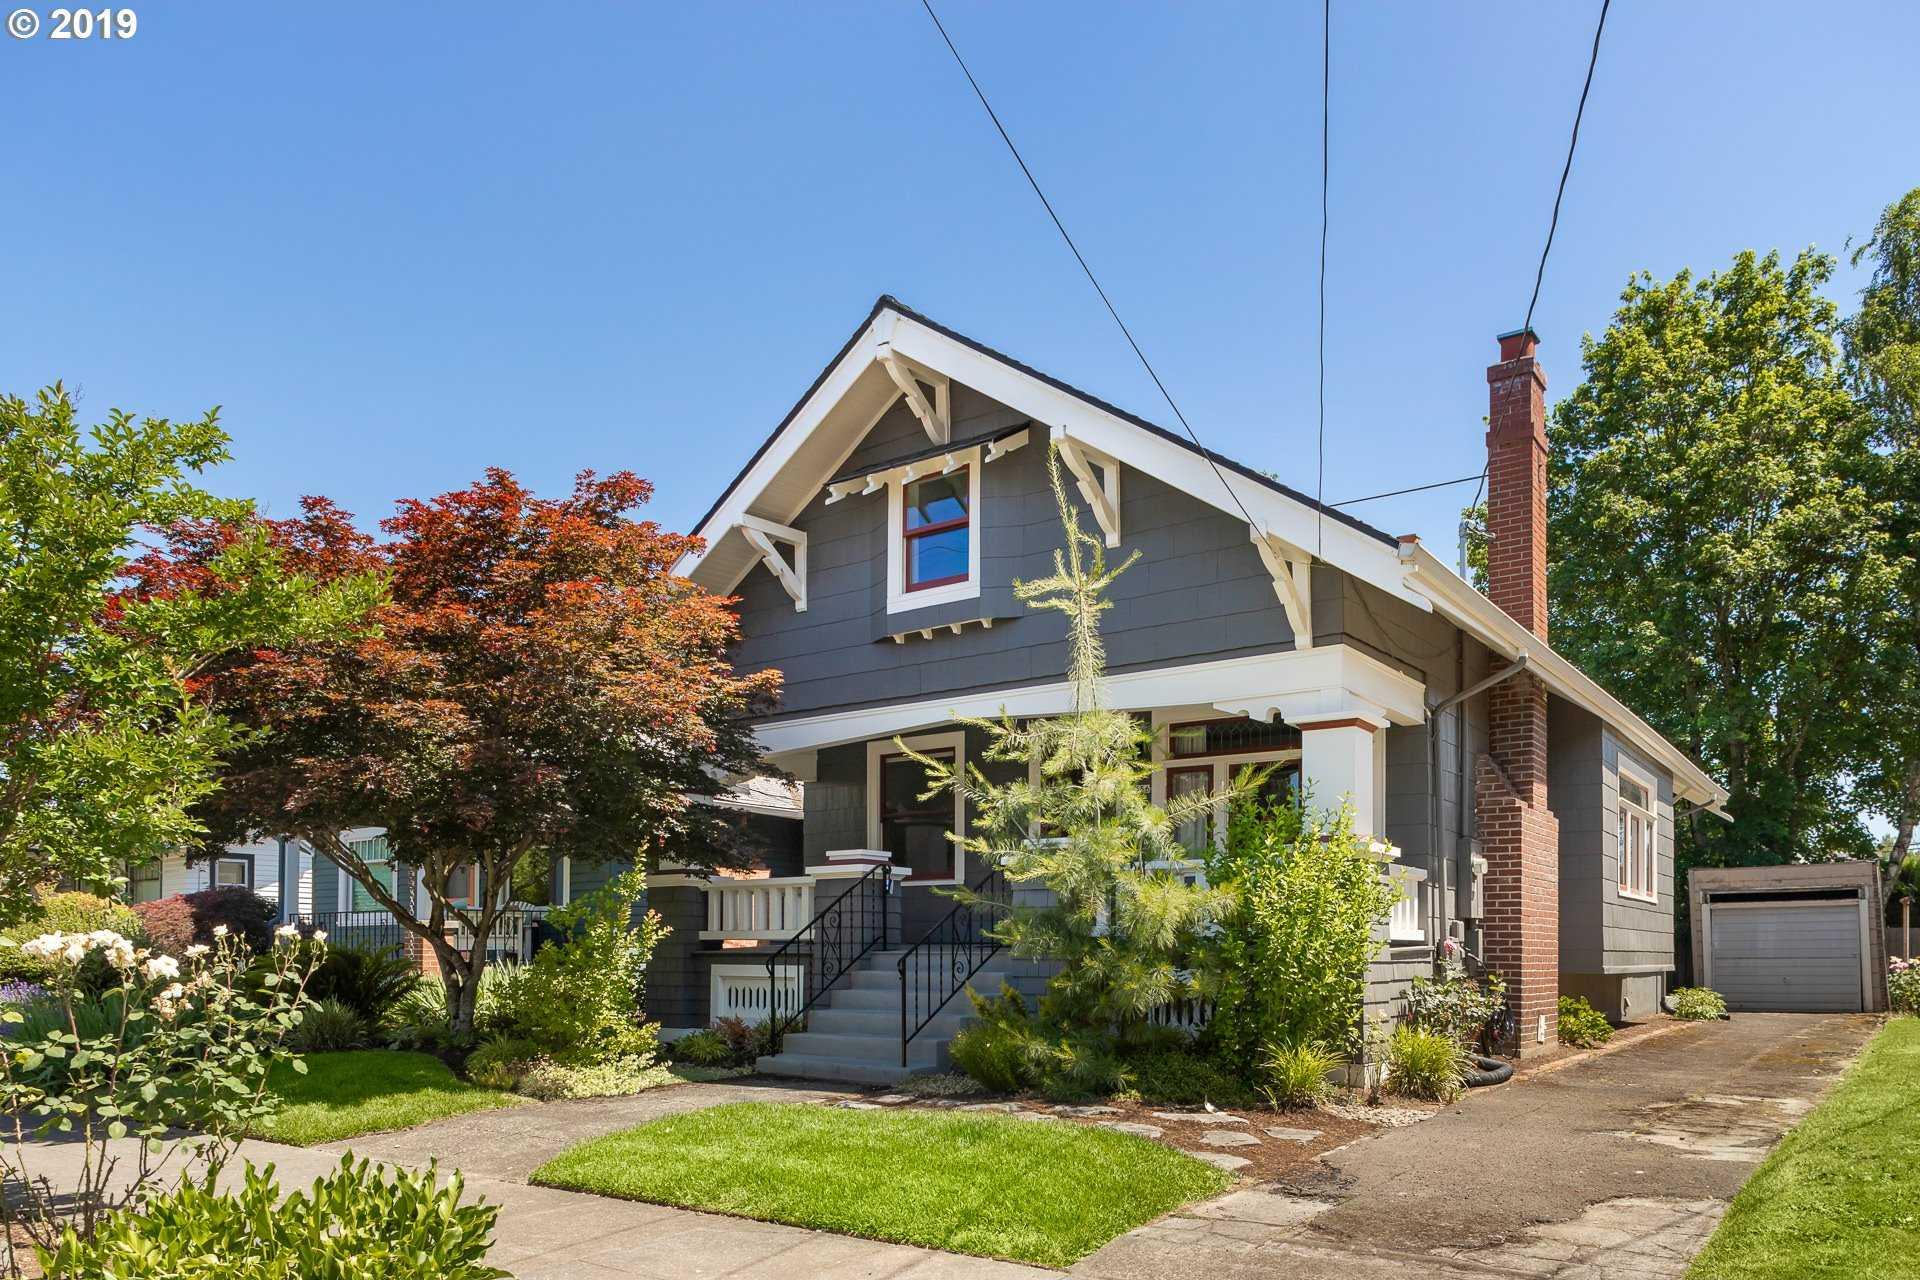 $550,000 - 3Br/1Ba -  for Sale in Richmond / Division, Portland